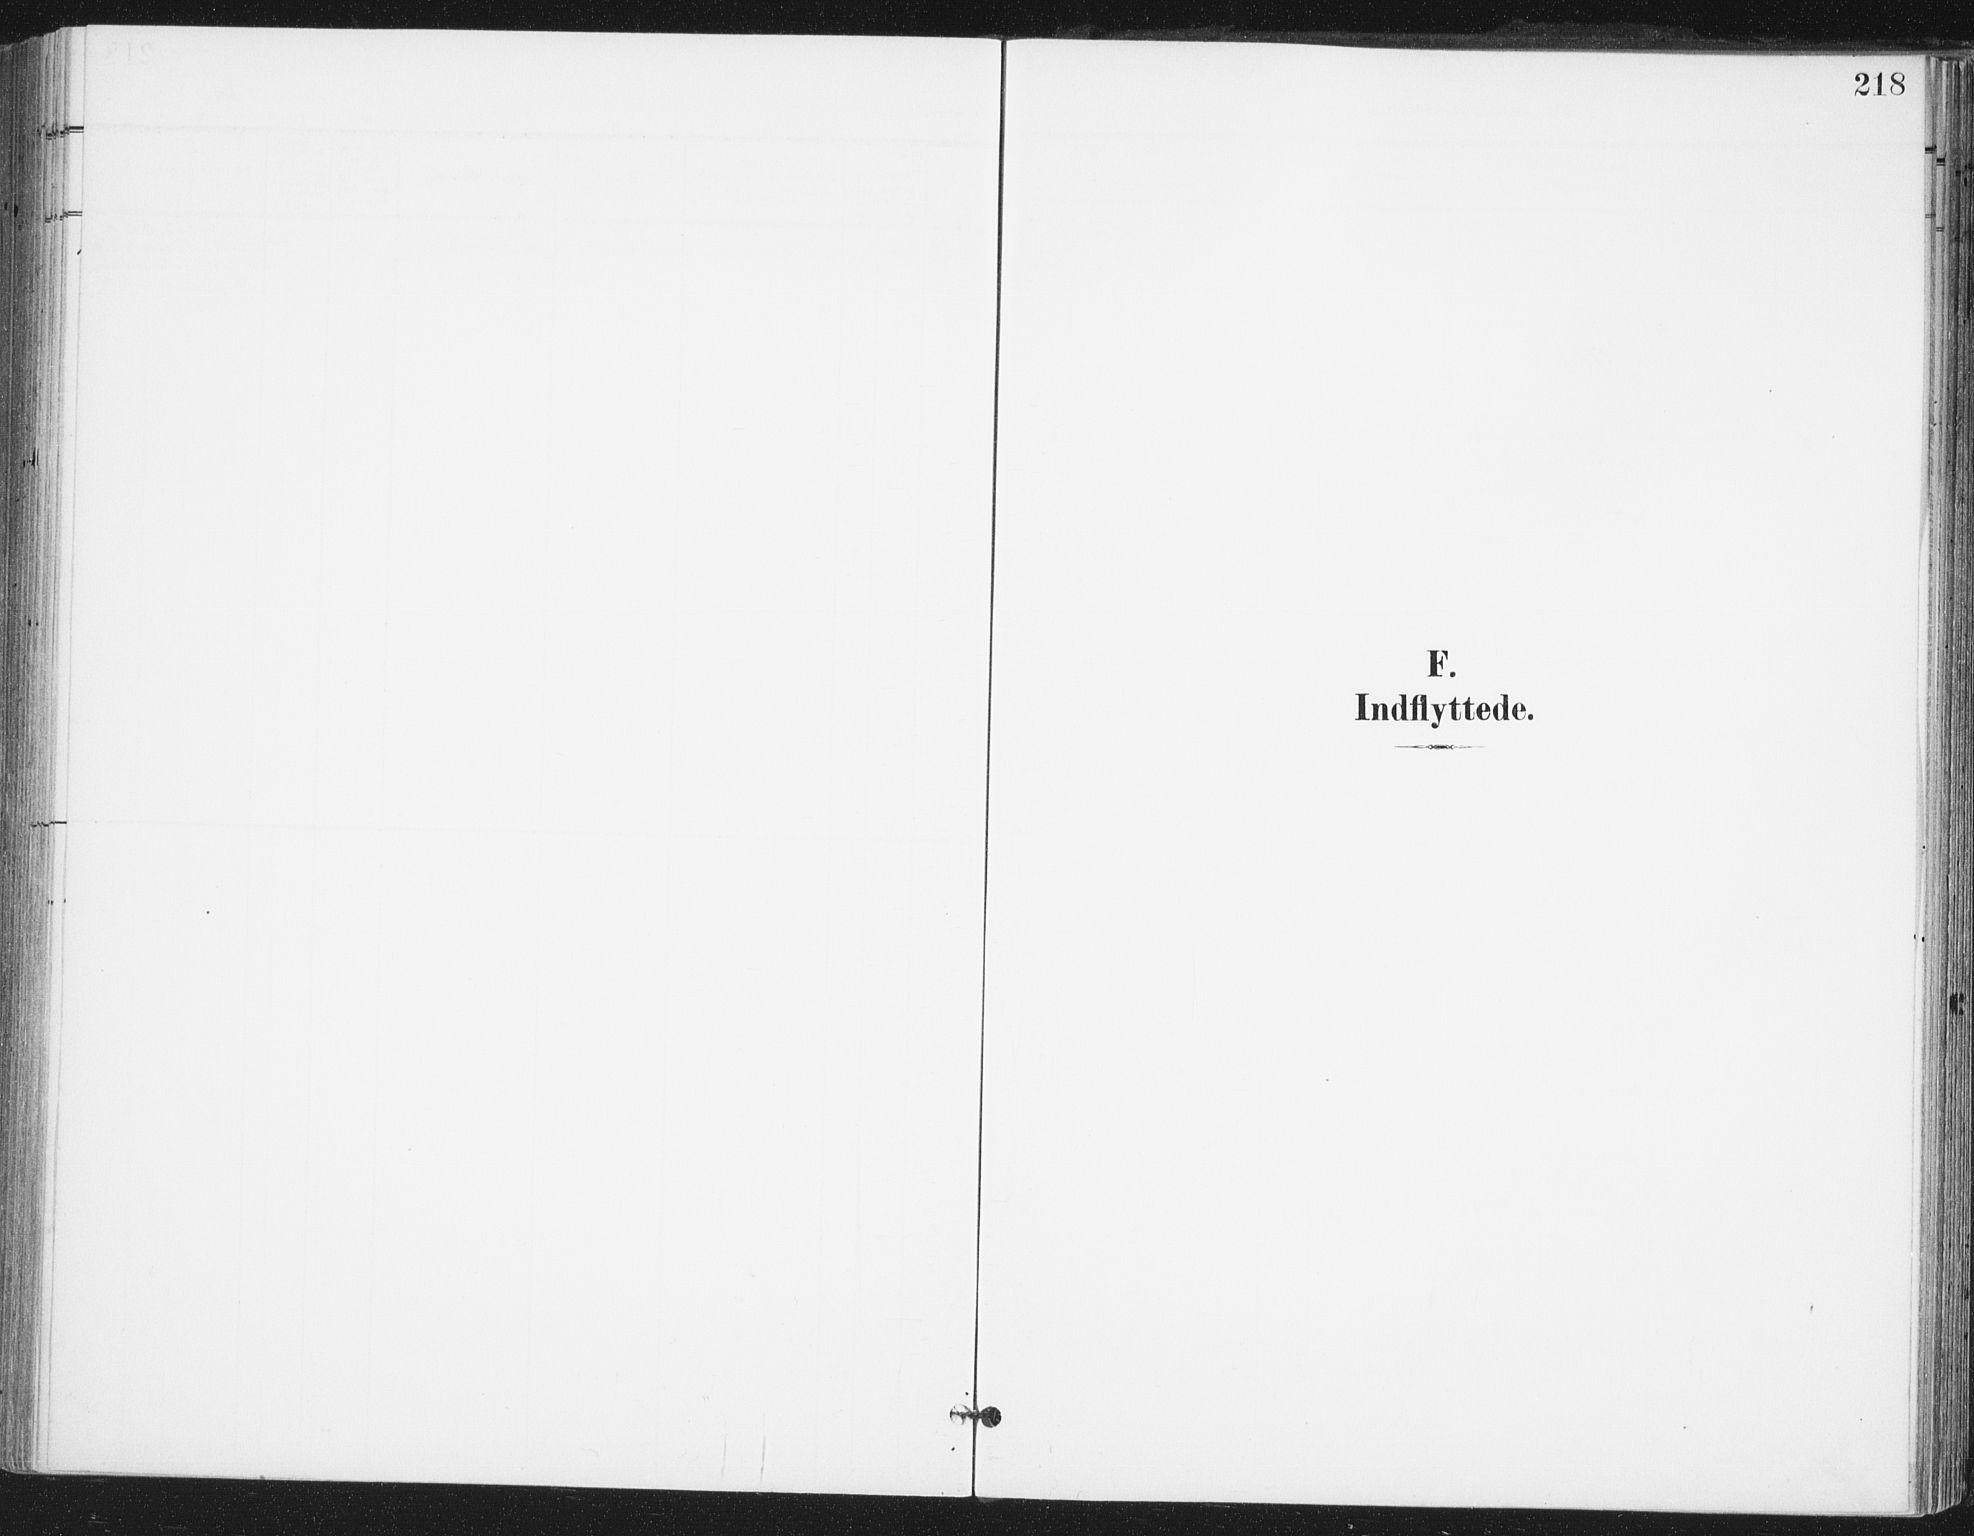 SAO, Ås prestekontor Kirkebøker, F/Fa/L0010: Parish register (official) no. I 10, 1900-1918, p. 218